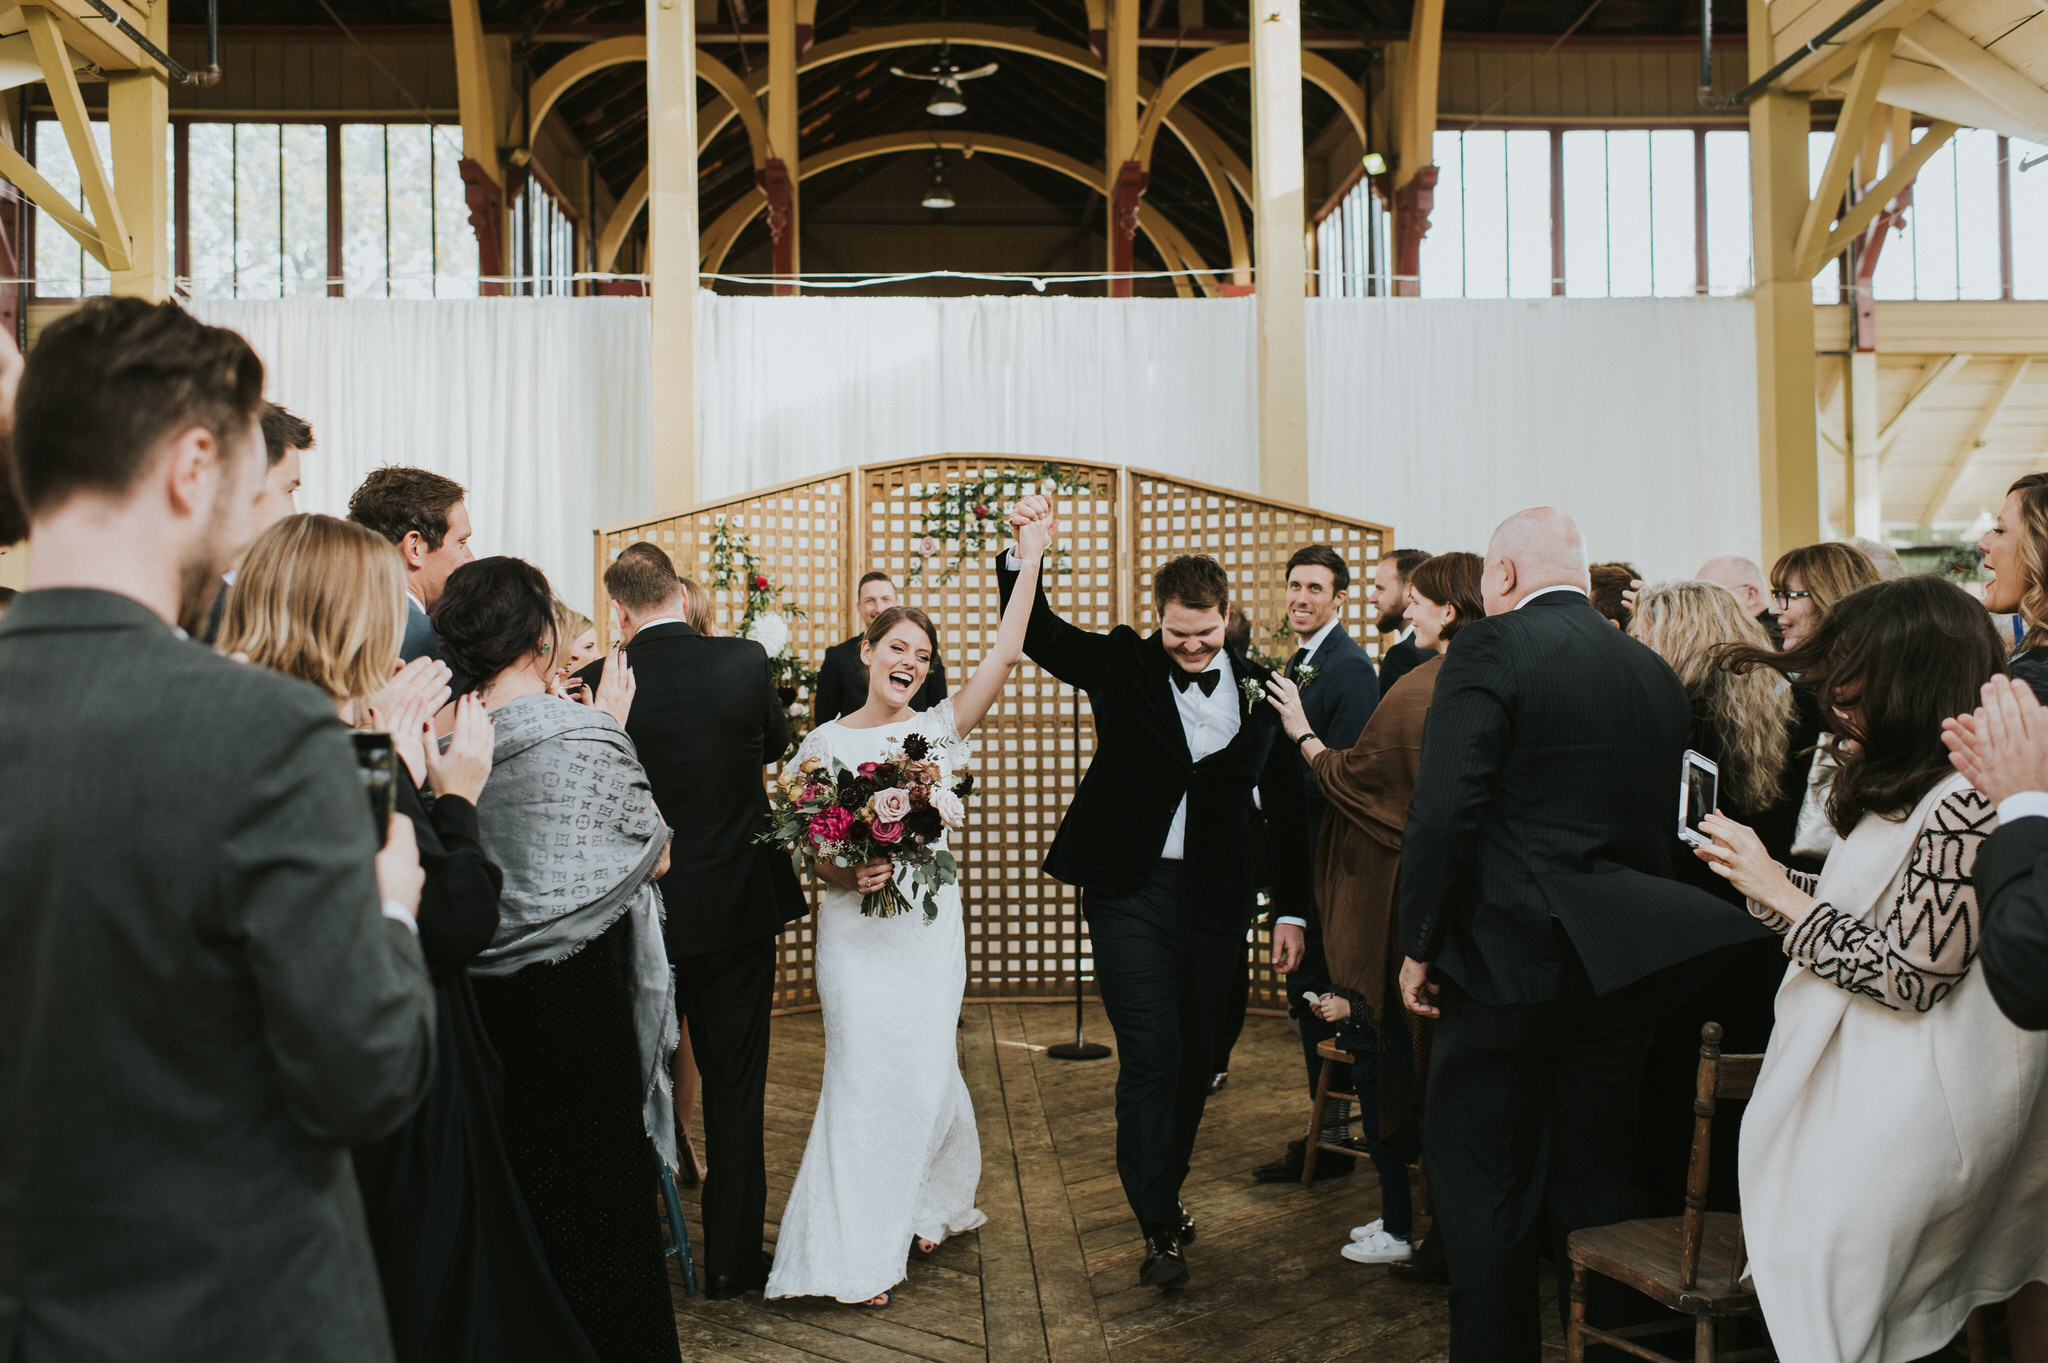 scarletoneillphotography_weddingphotography_prince edward county weddings123.JPG